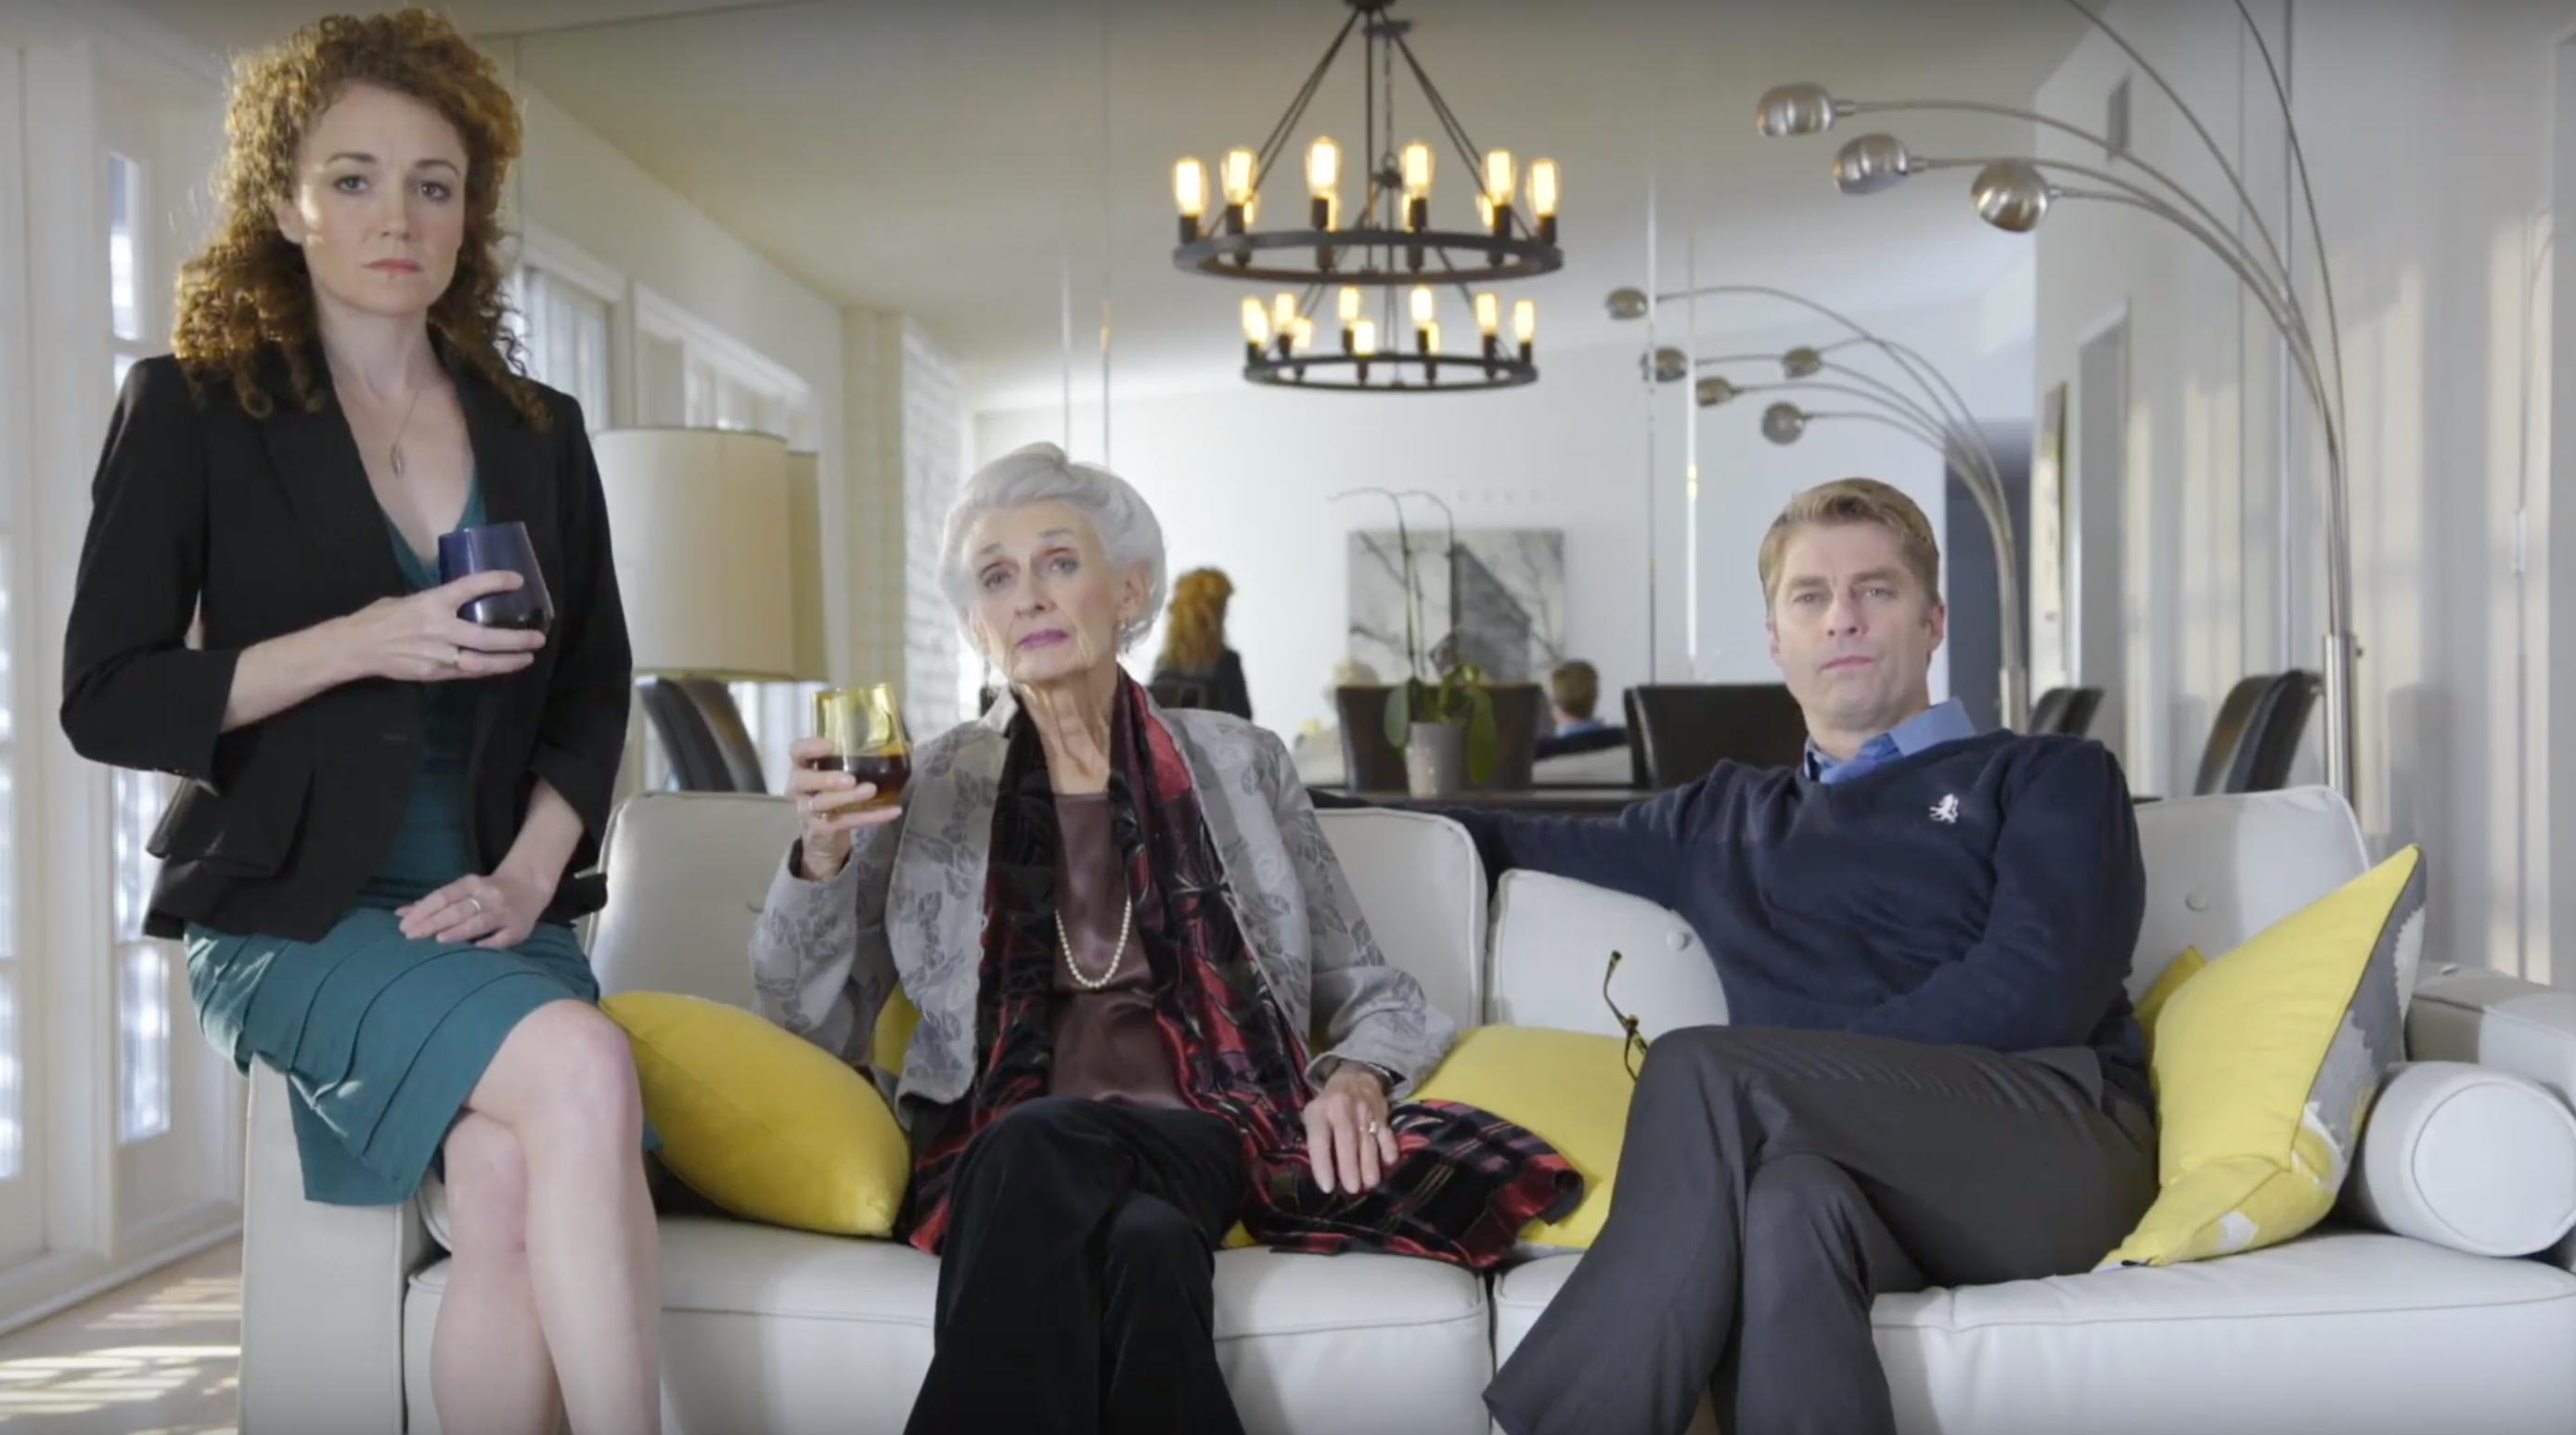 Jamison Jones, Irene Roseen, and Joanna Strapp in Borderline Talent (2018)